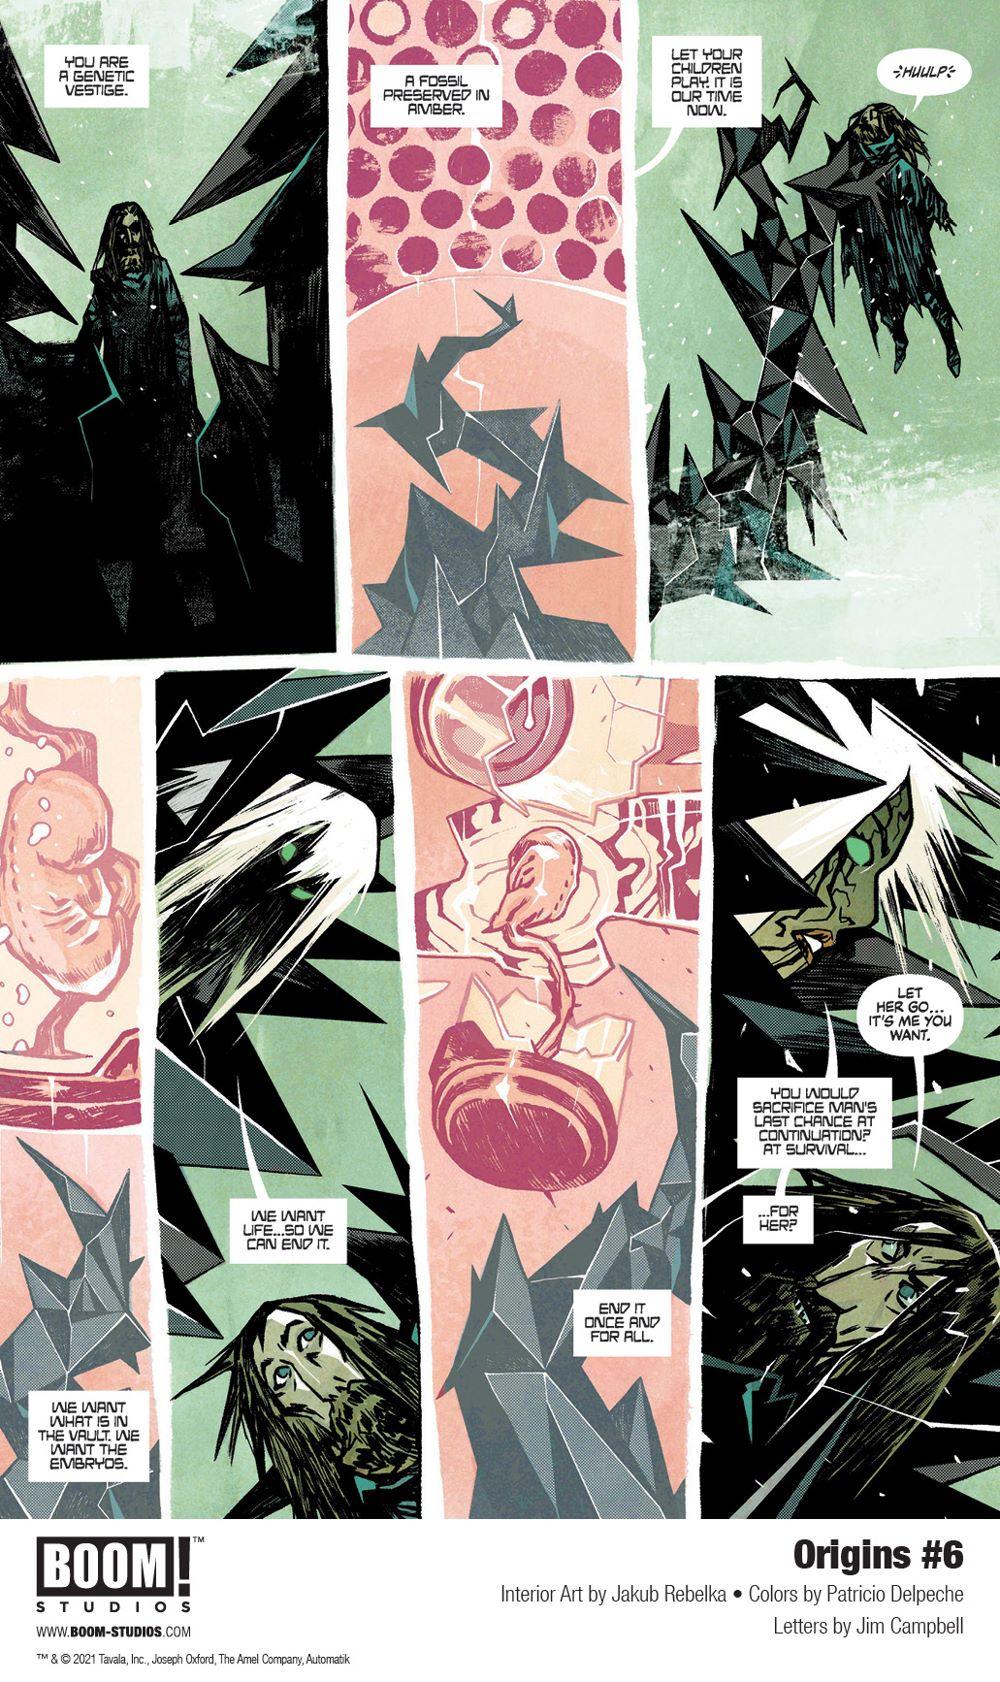 Origins_006_InteriorArt_005_PROMO First Look at BOOM! Studios' ORIGINS #6